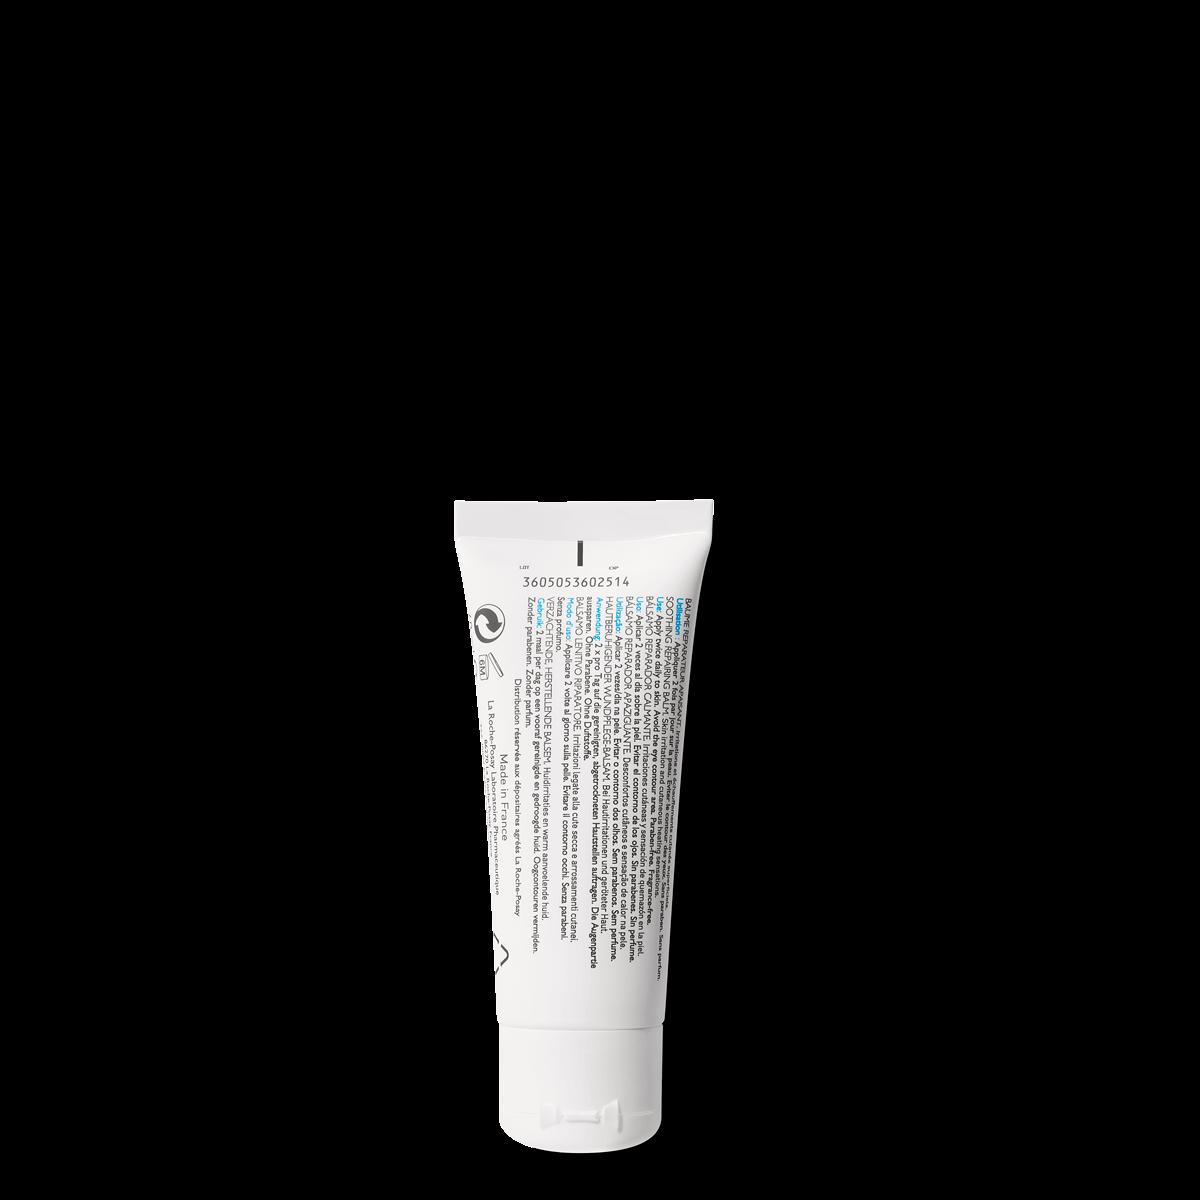 cicaplast baume b5  40ml rótulo embalagem